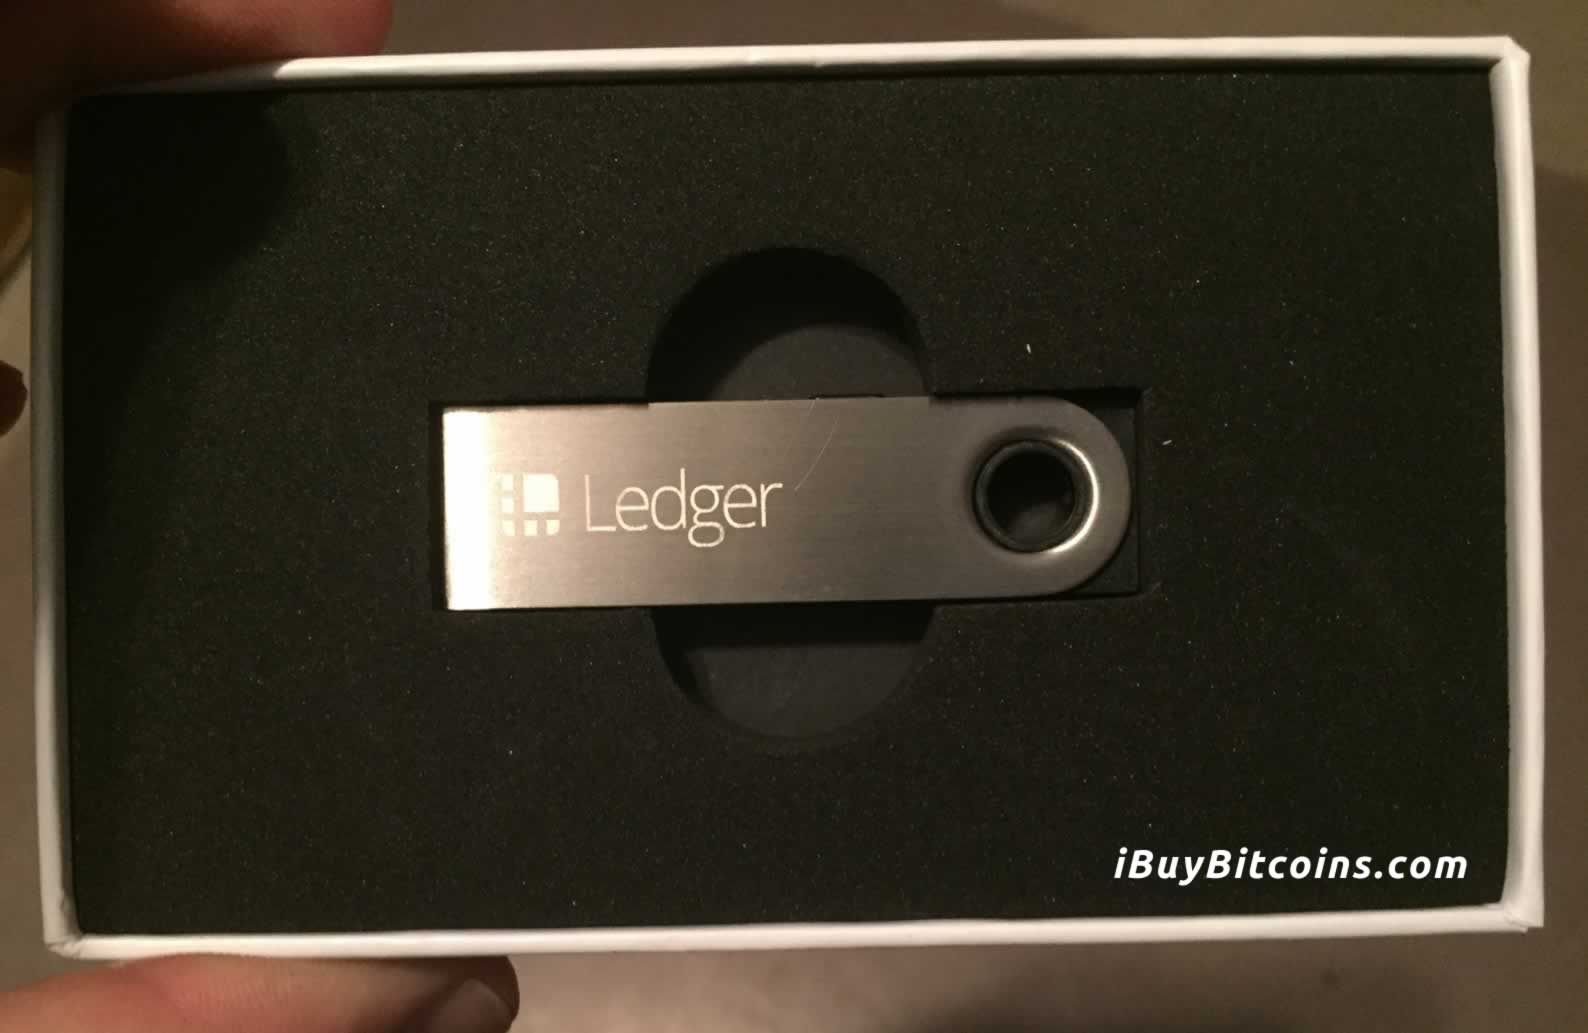 Ledger Nano S Bitcoin Wallet Inside the Box